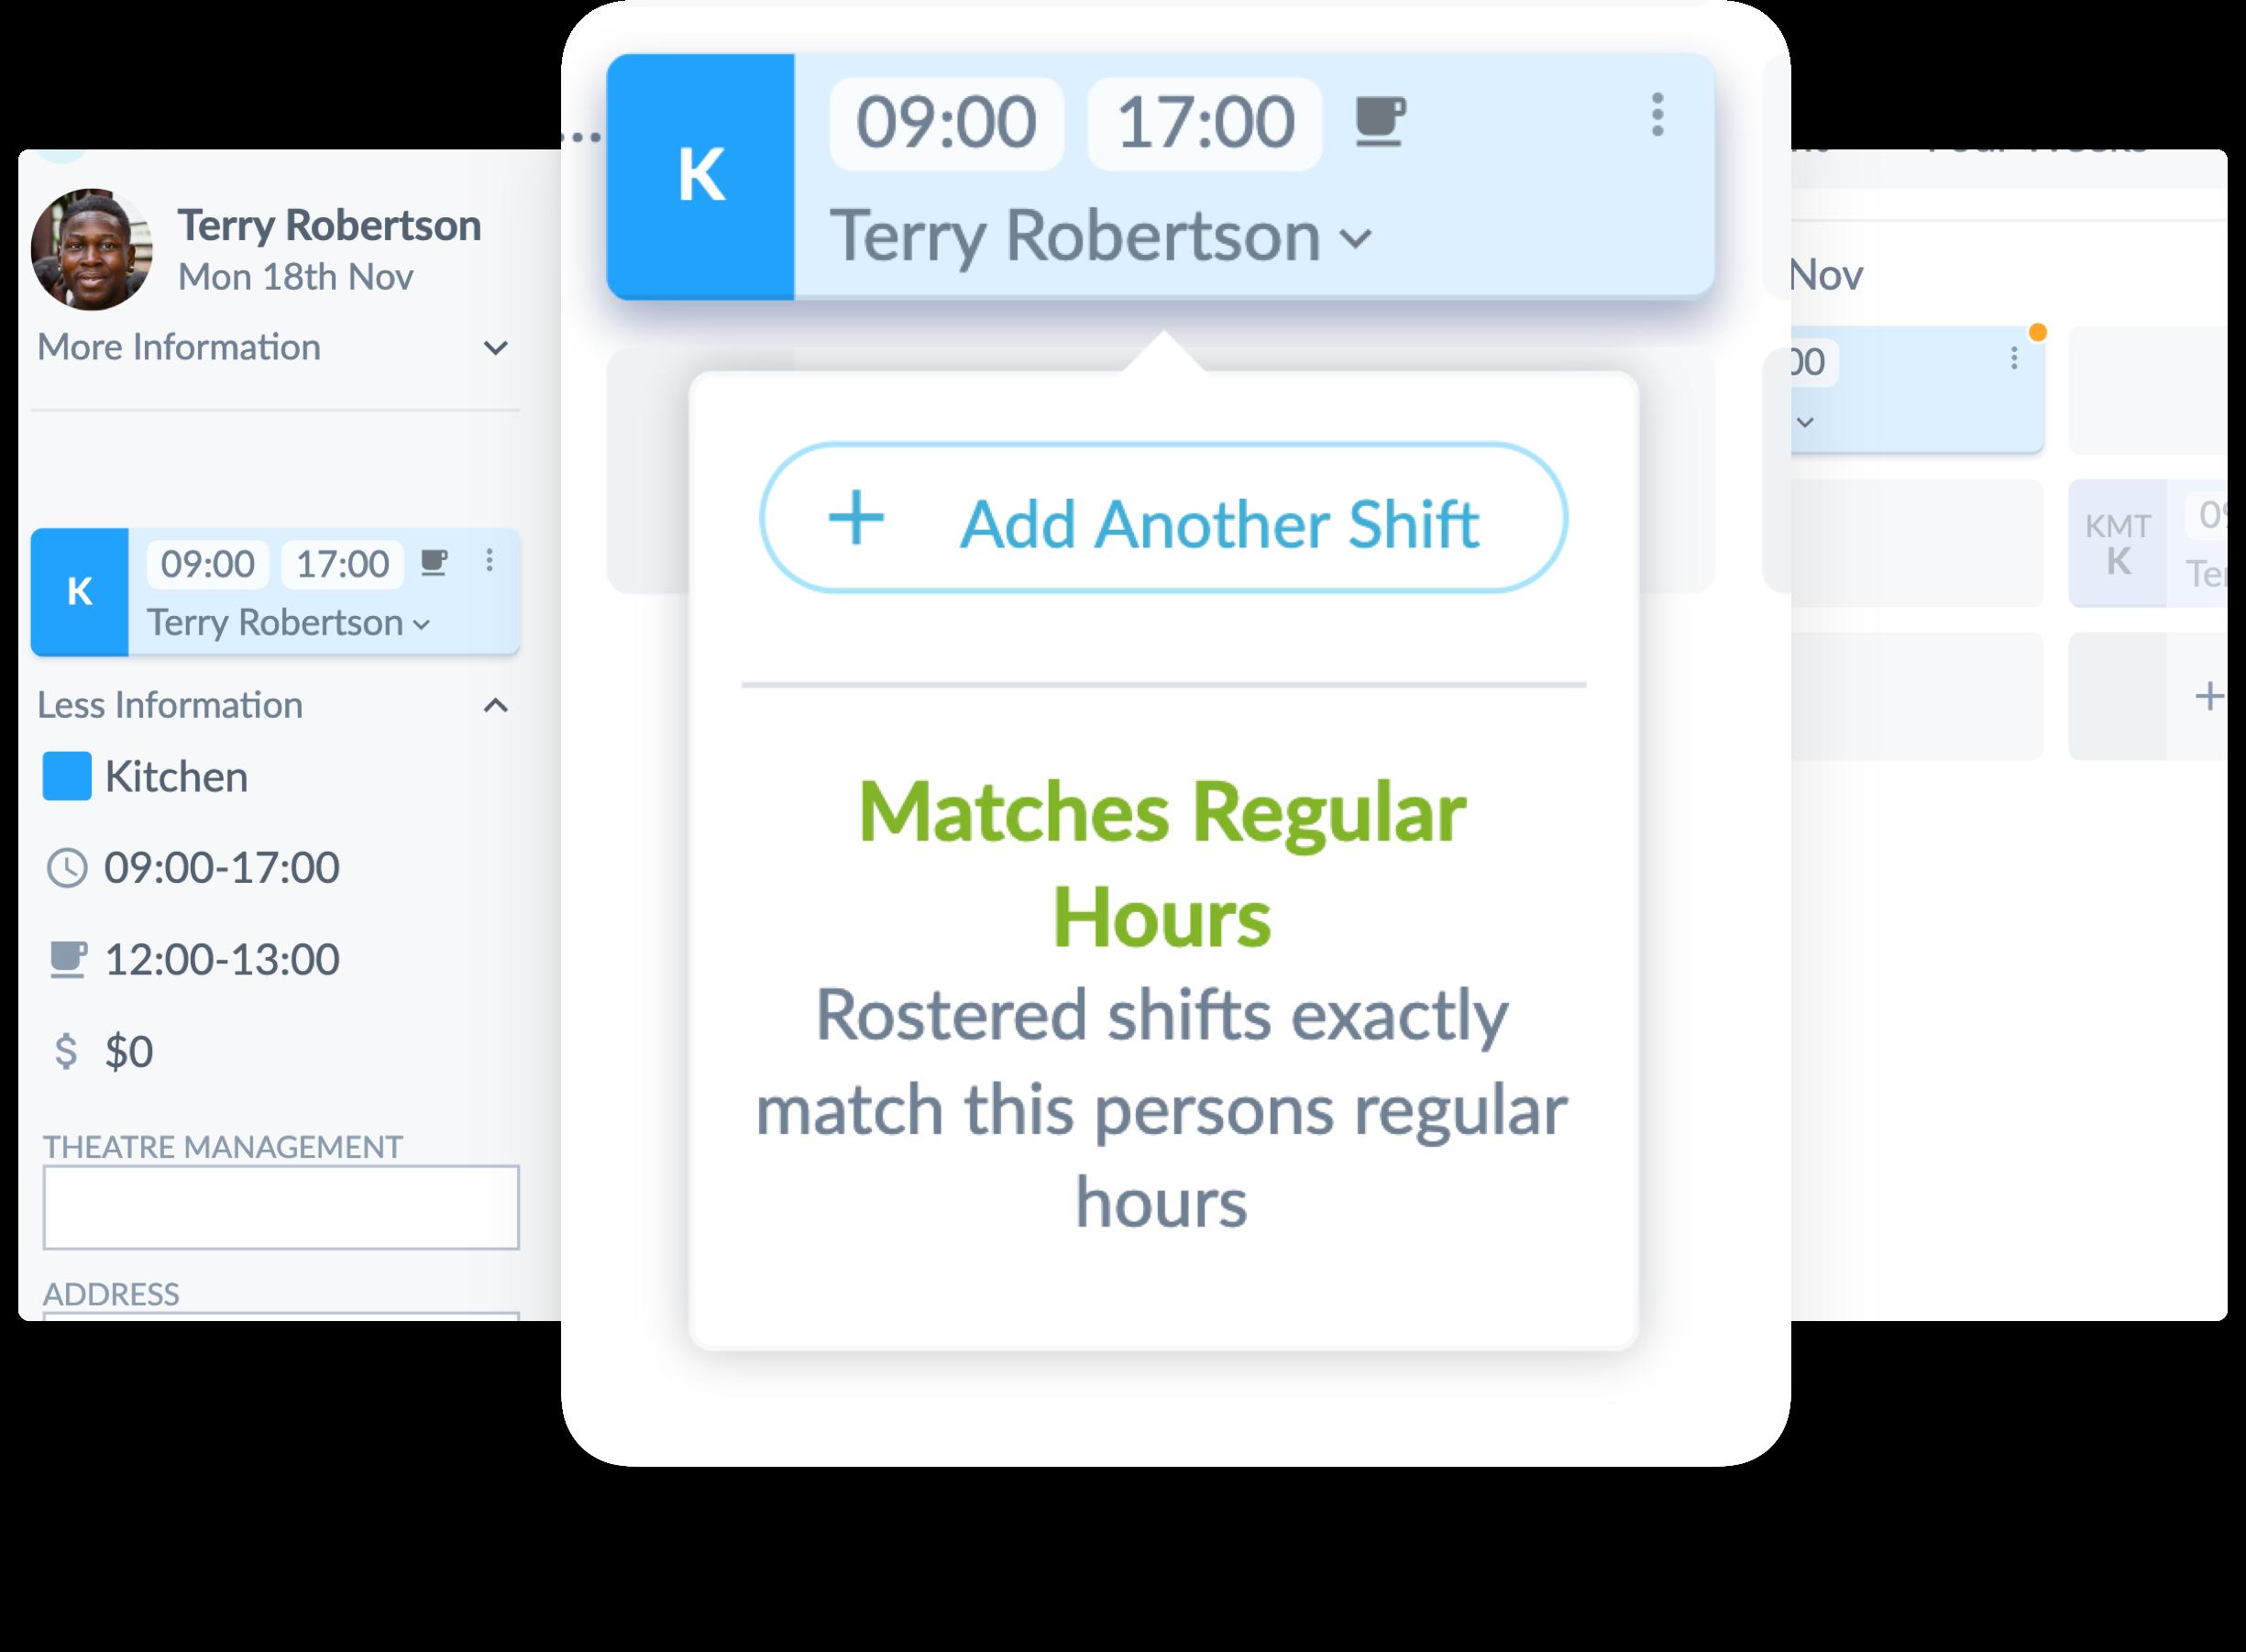 Matches regular hours